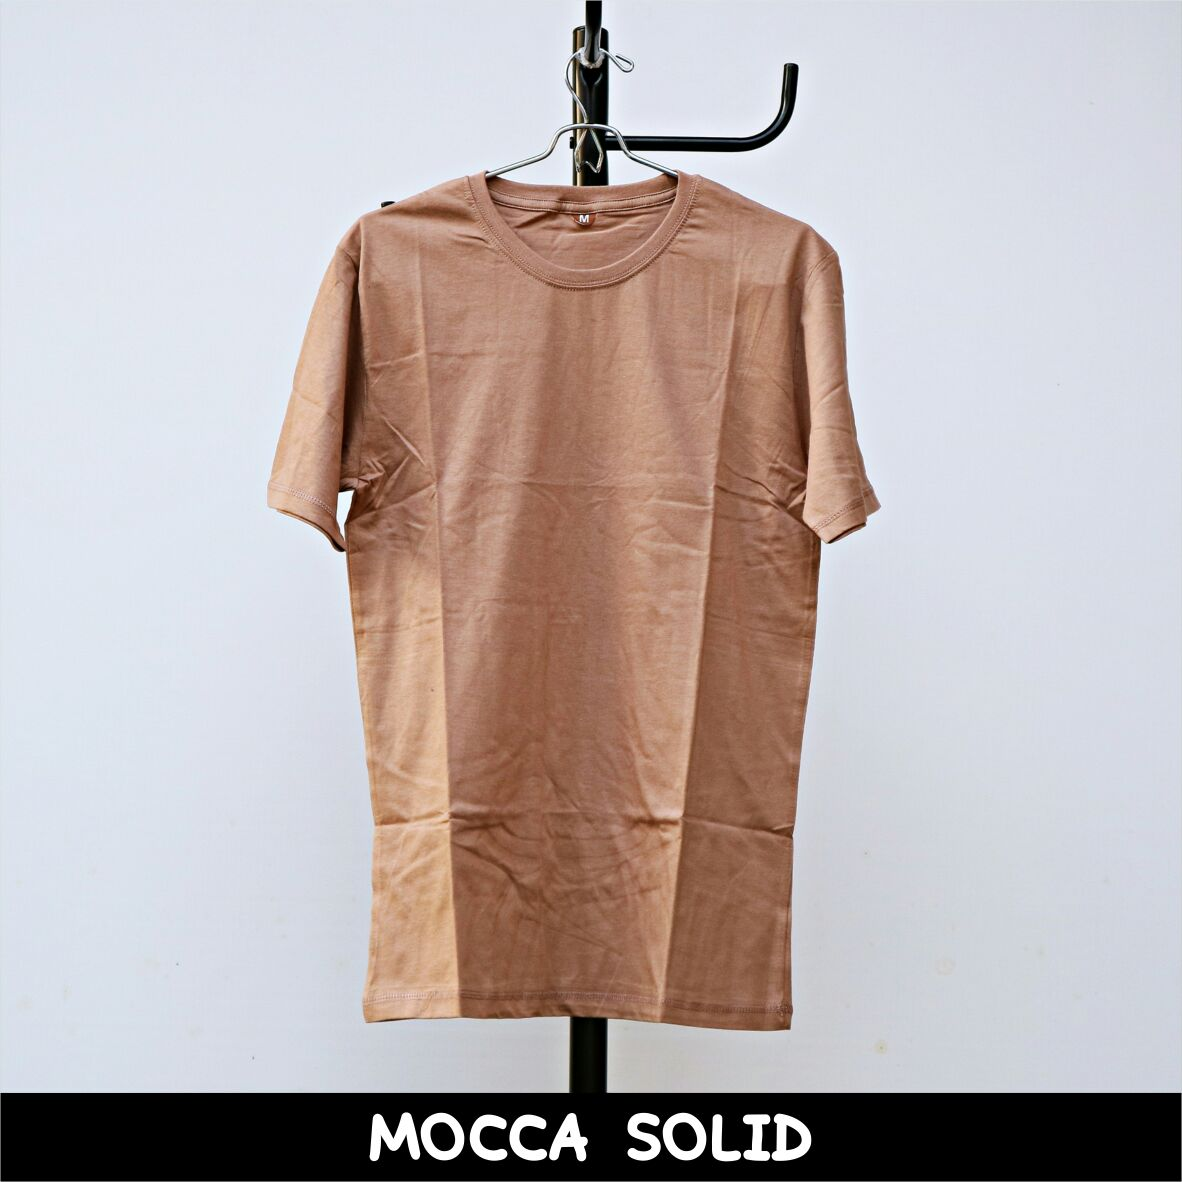 Kaos Polos Premium Shop Line Maroon Solid Mocca